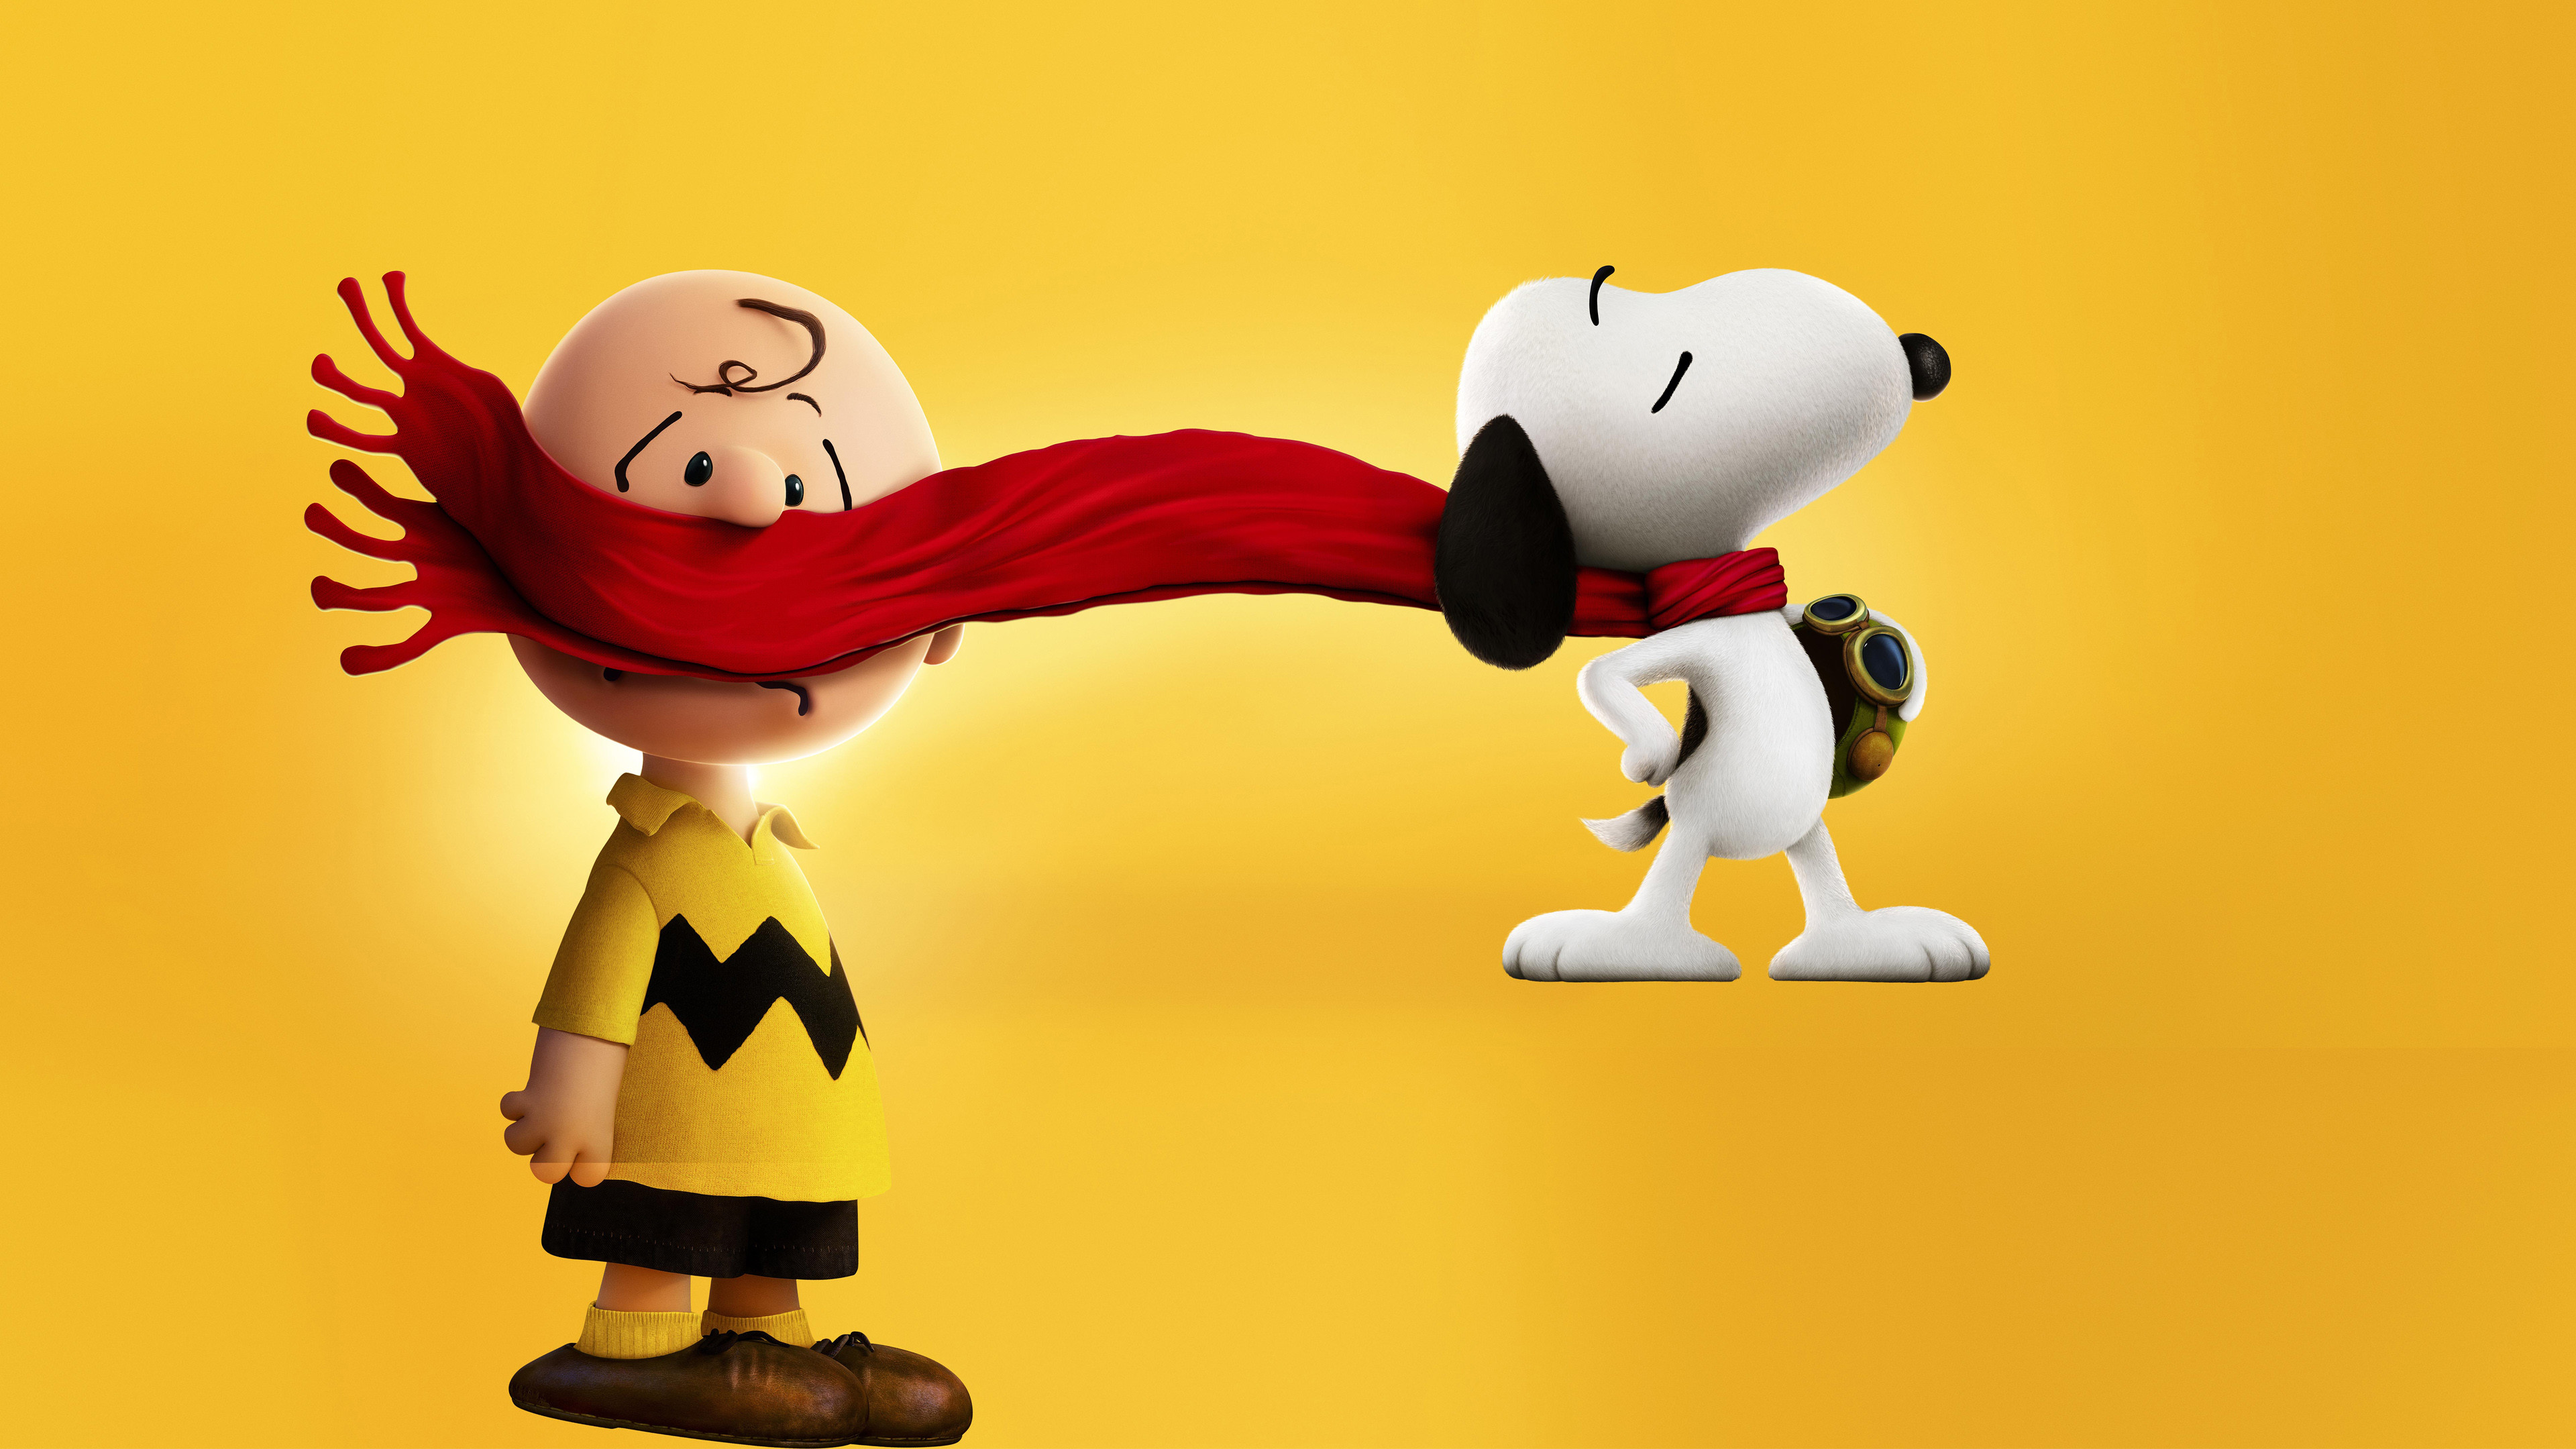 A Charlie Brown Christmas Wallpaper Cartoon Wallpapers - Charlie Brown - HD Wallpaper